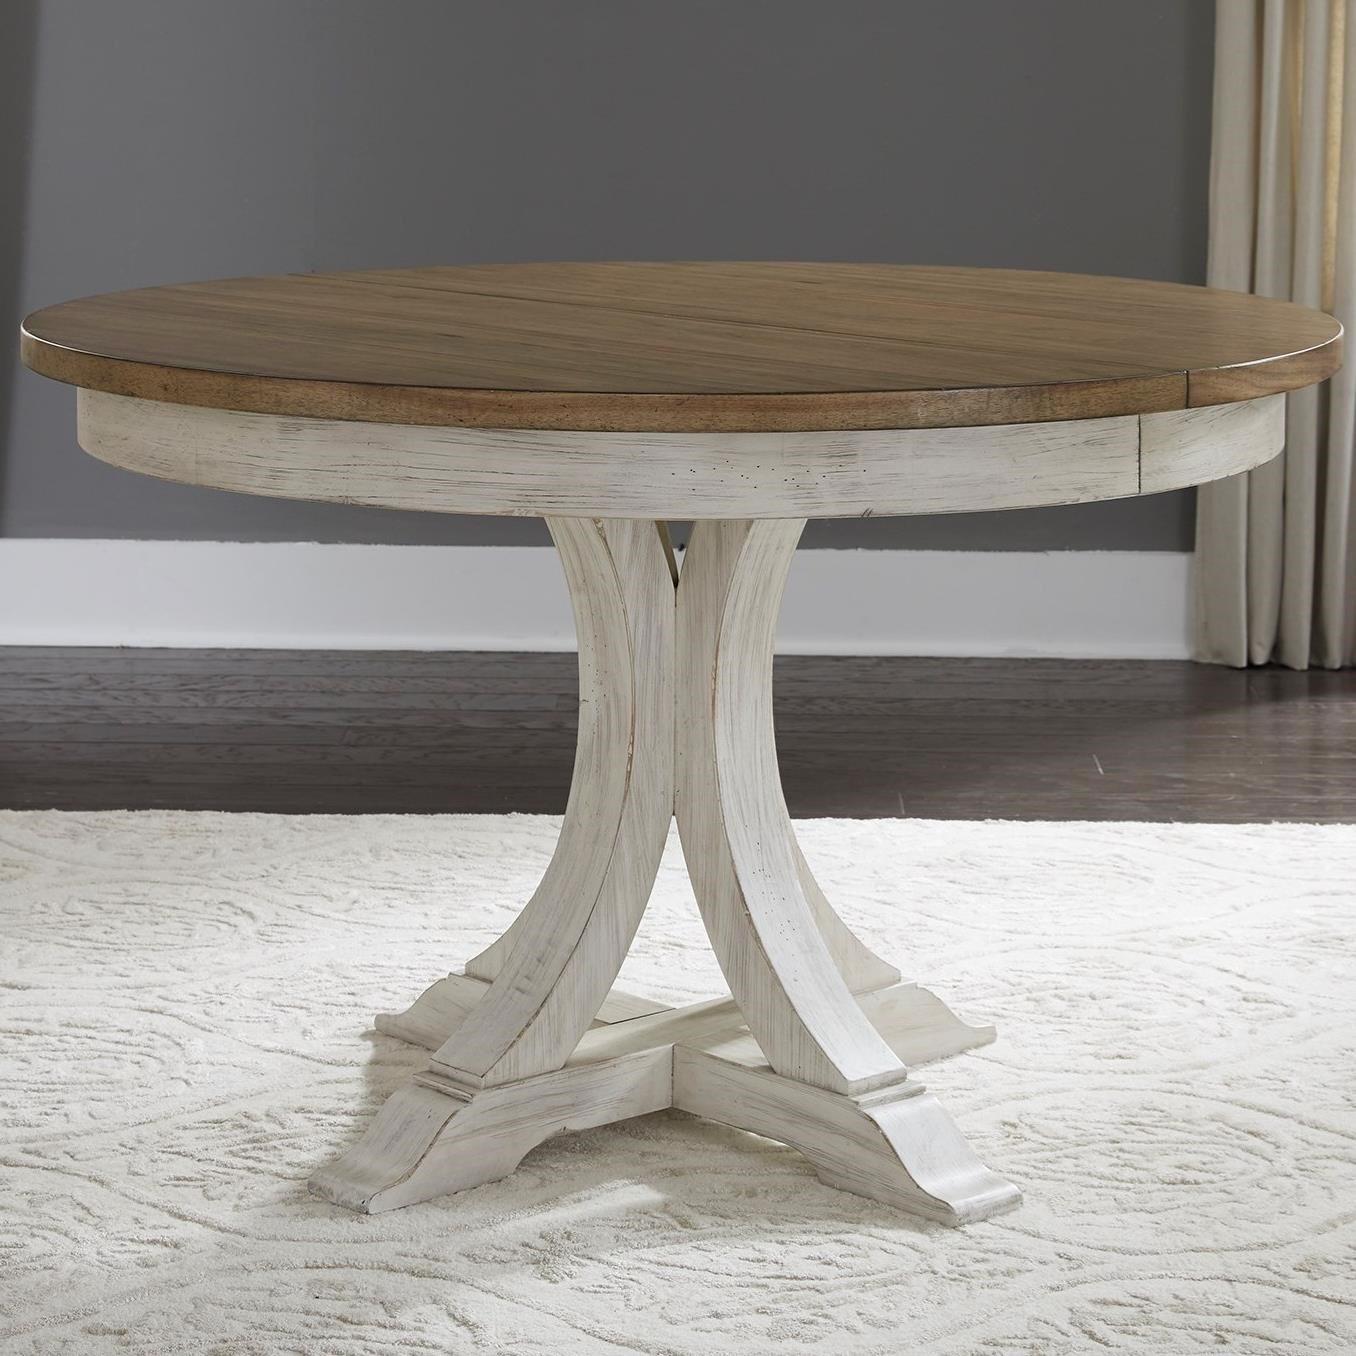 Charmant Liberty Furniture Farmhouse ReimaginedPedestal Table